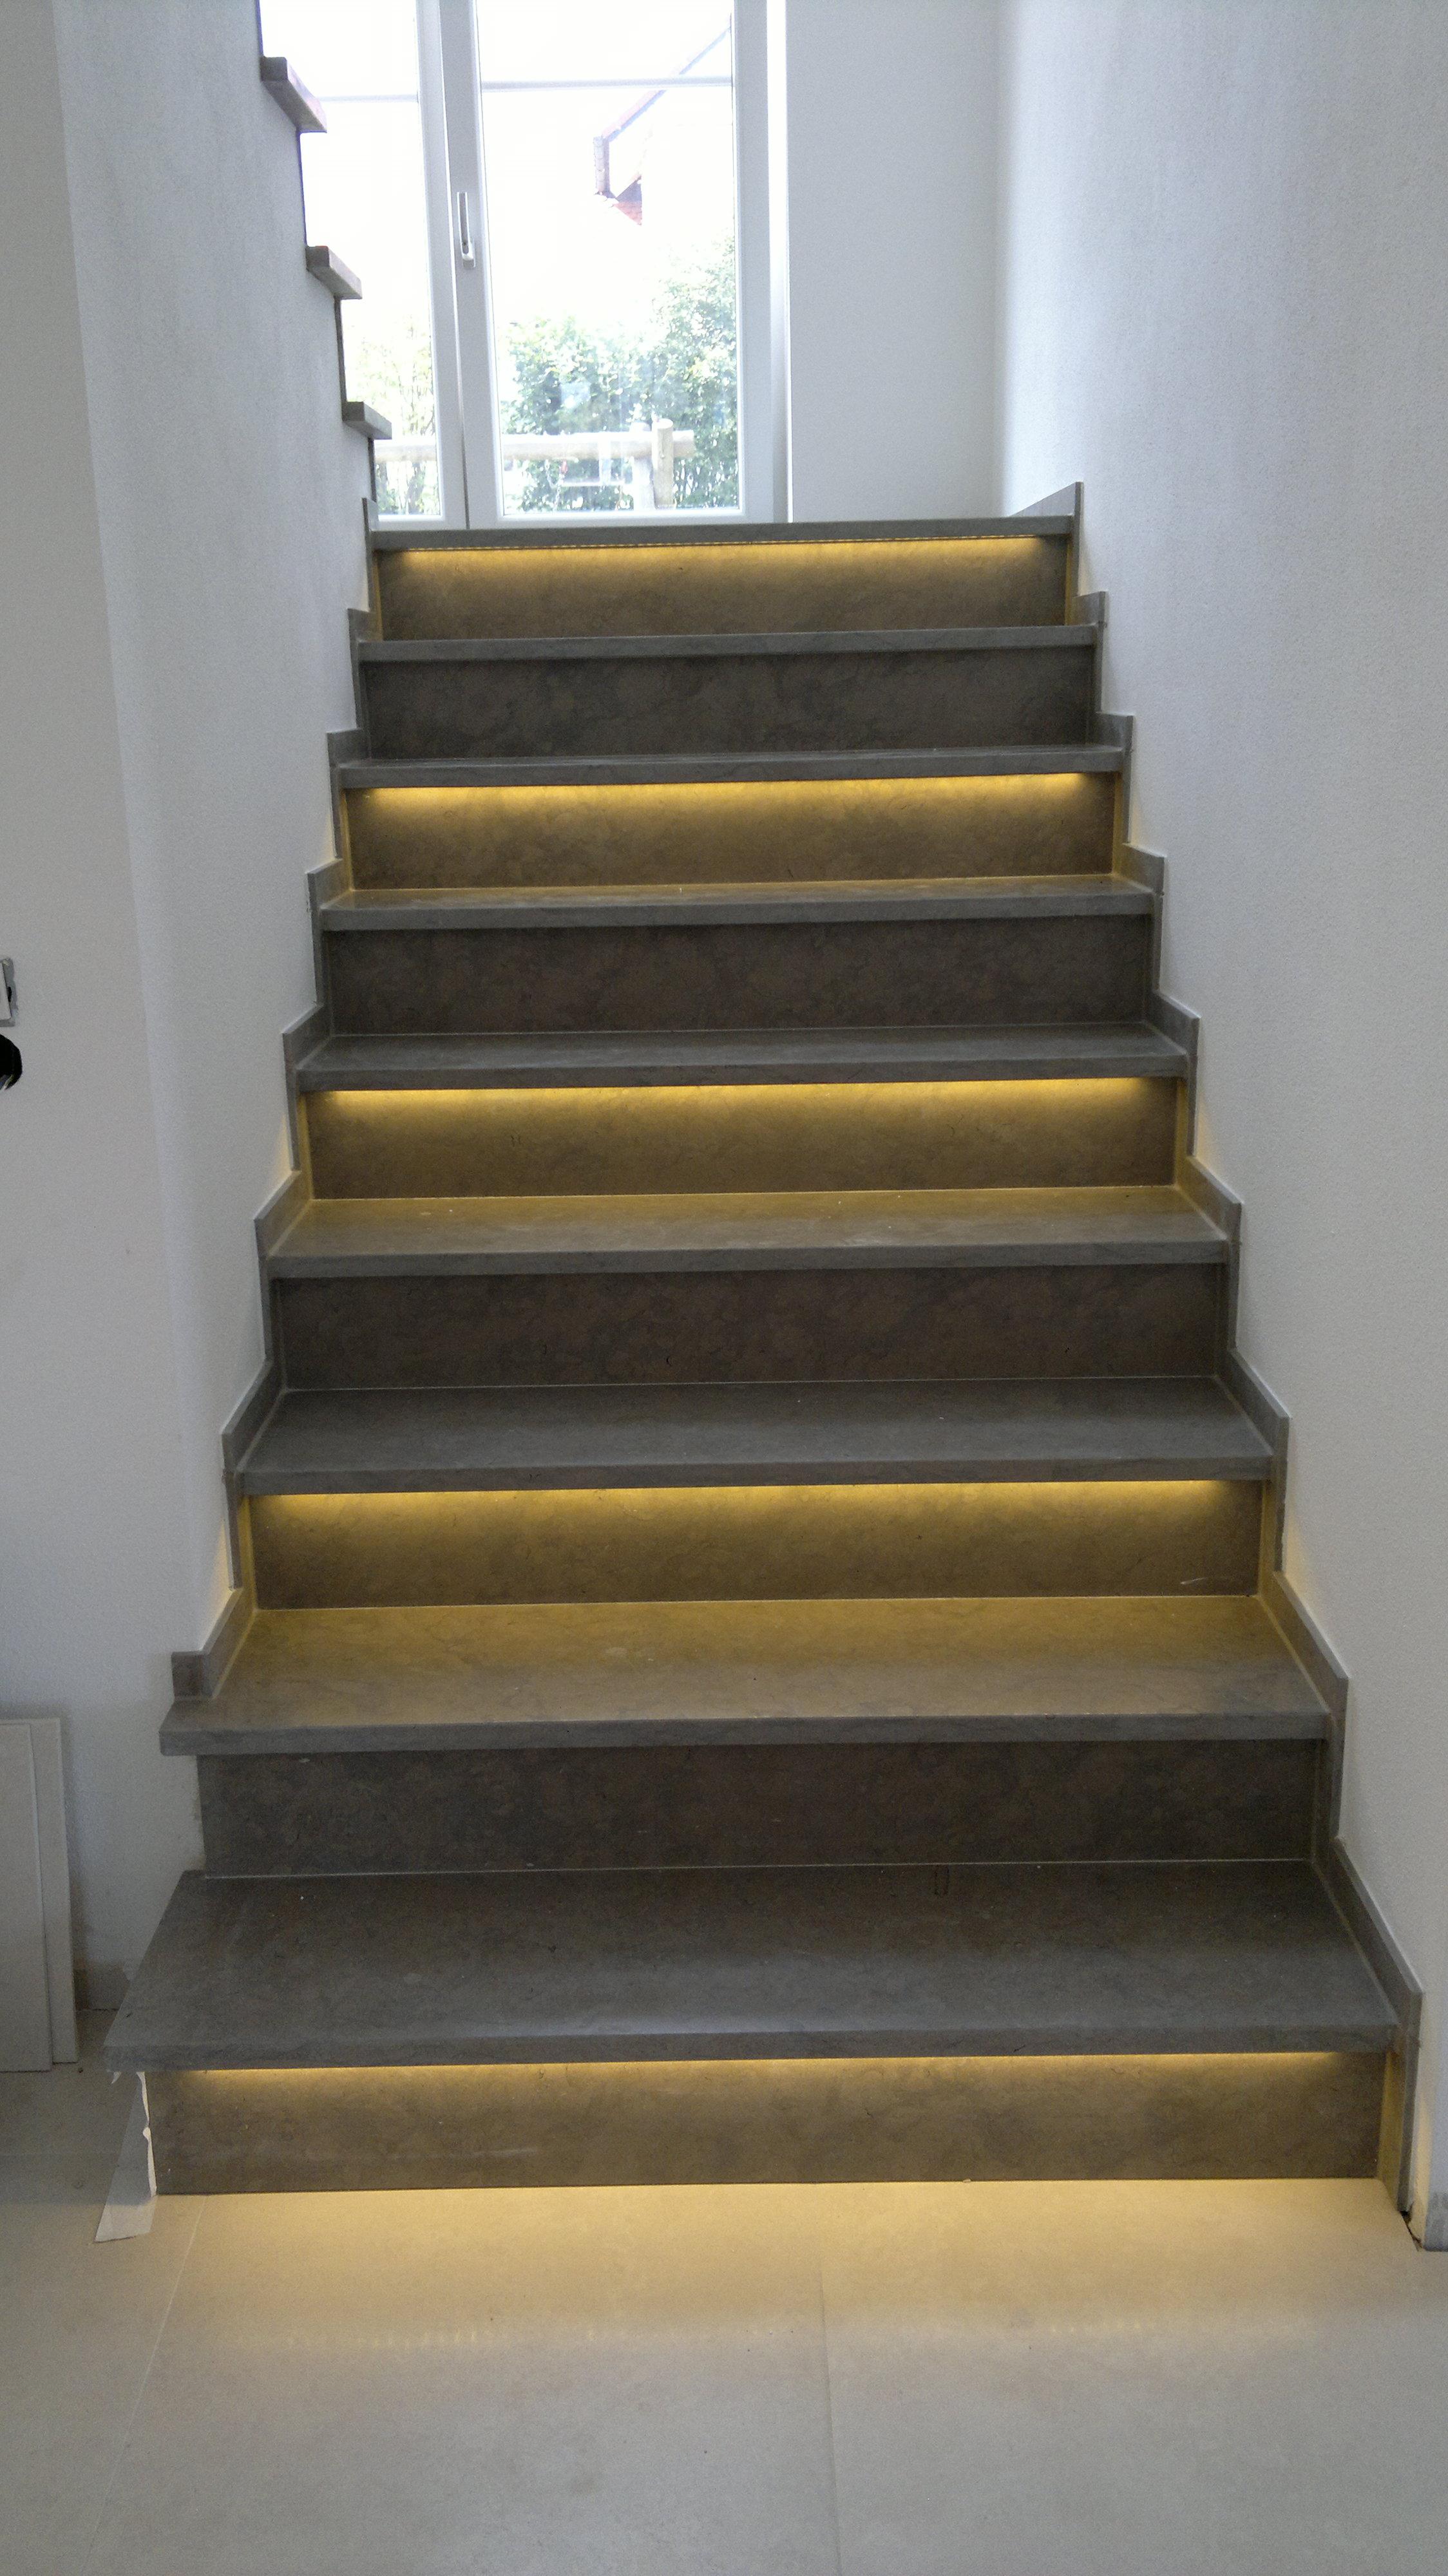 LED Treppen Beleuchtung: GS-LED - Individuelle LED-Technik ...